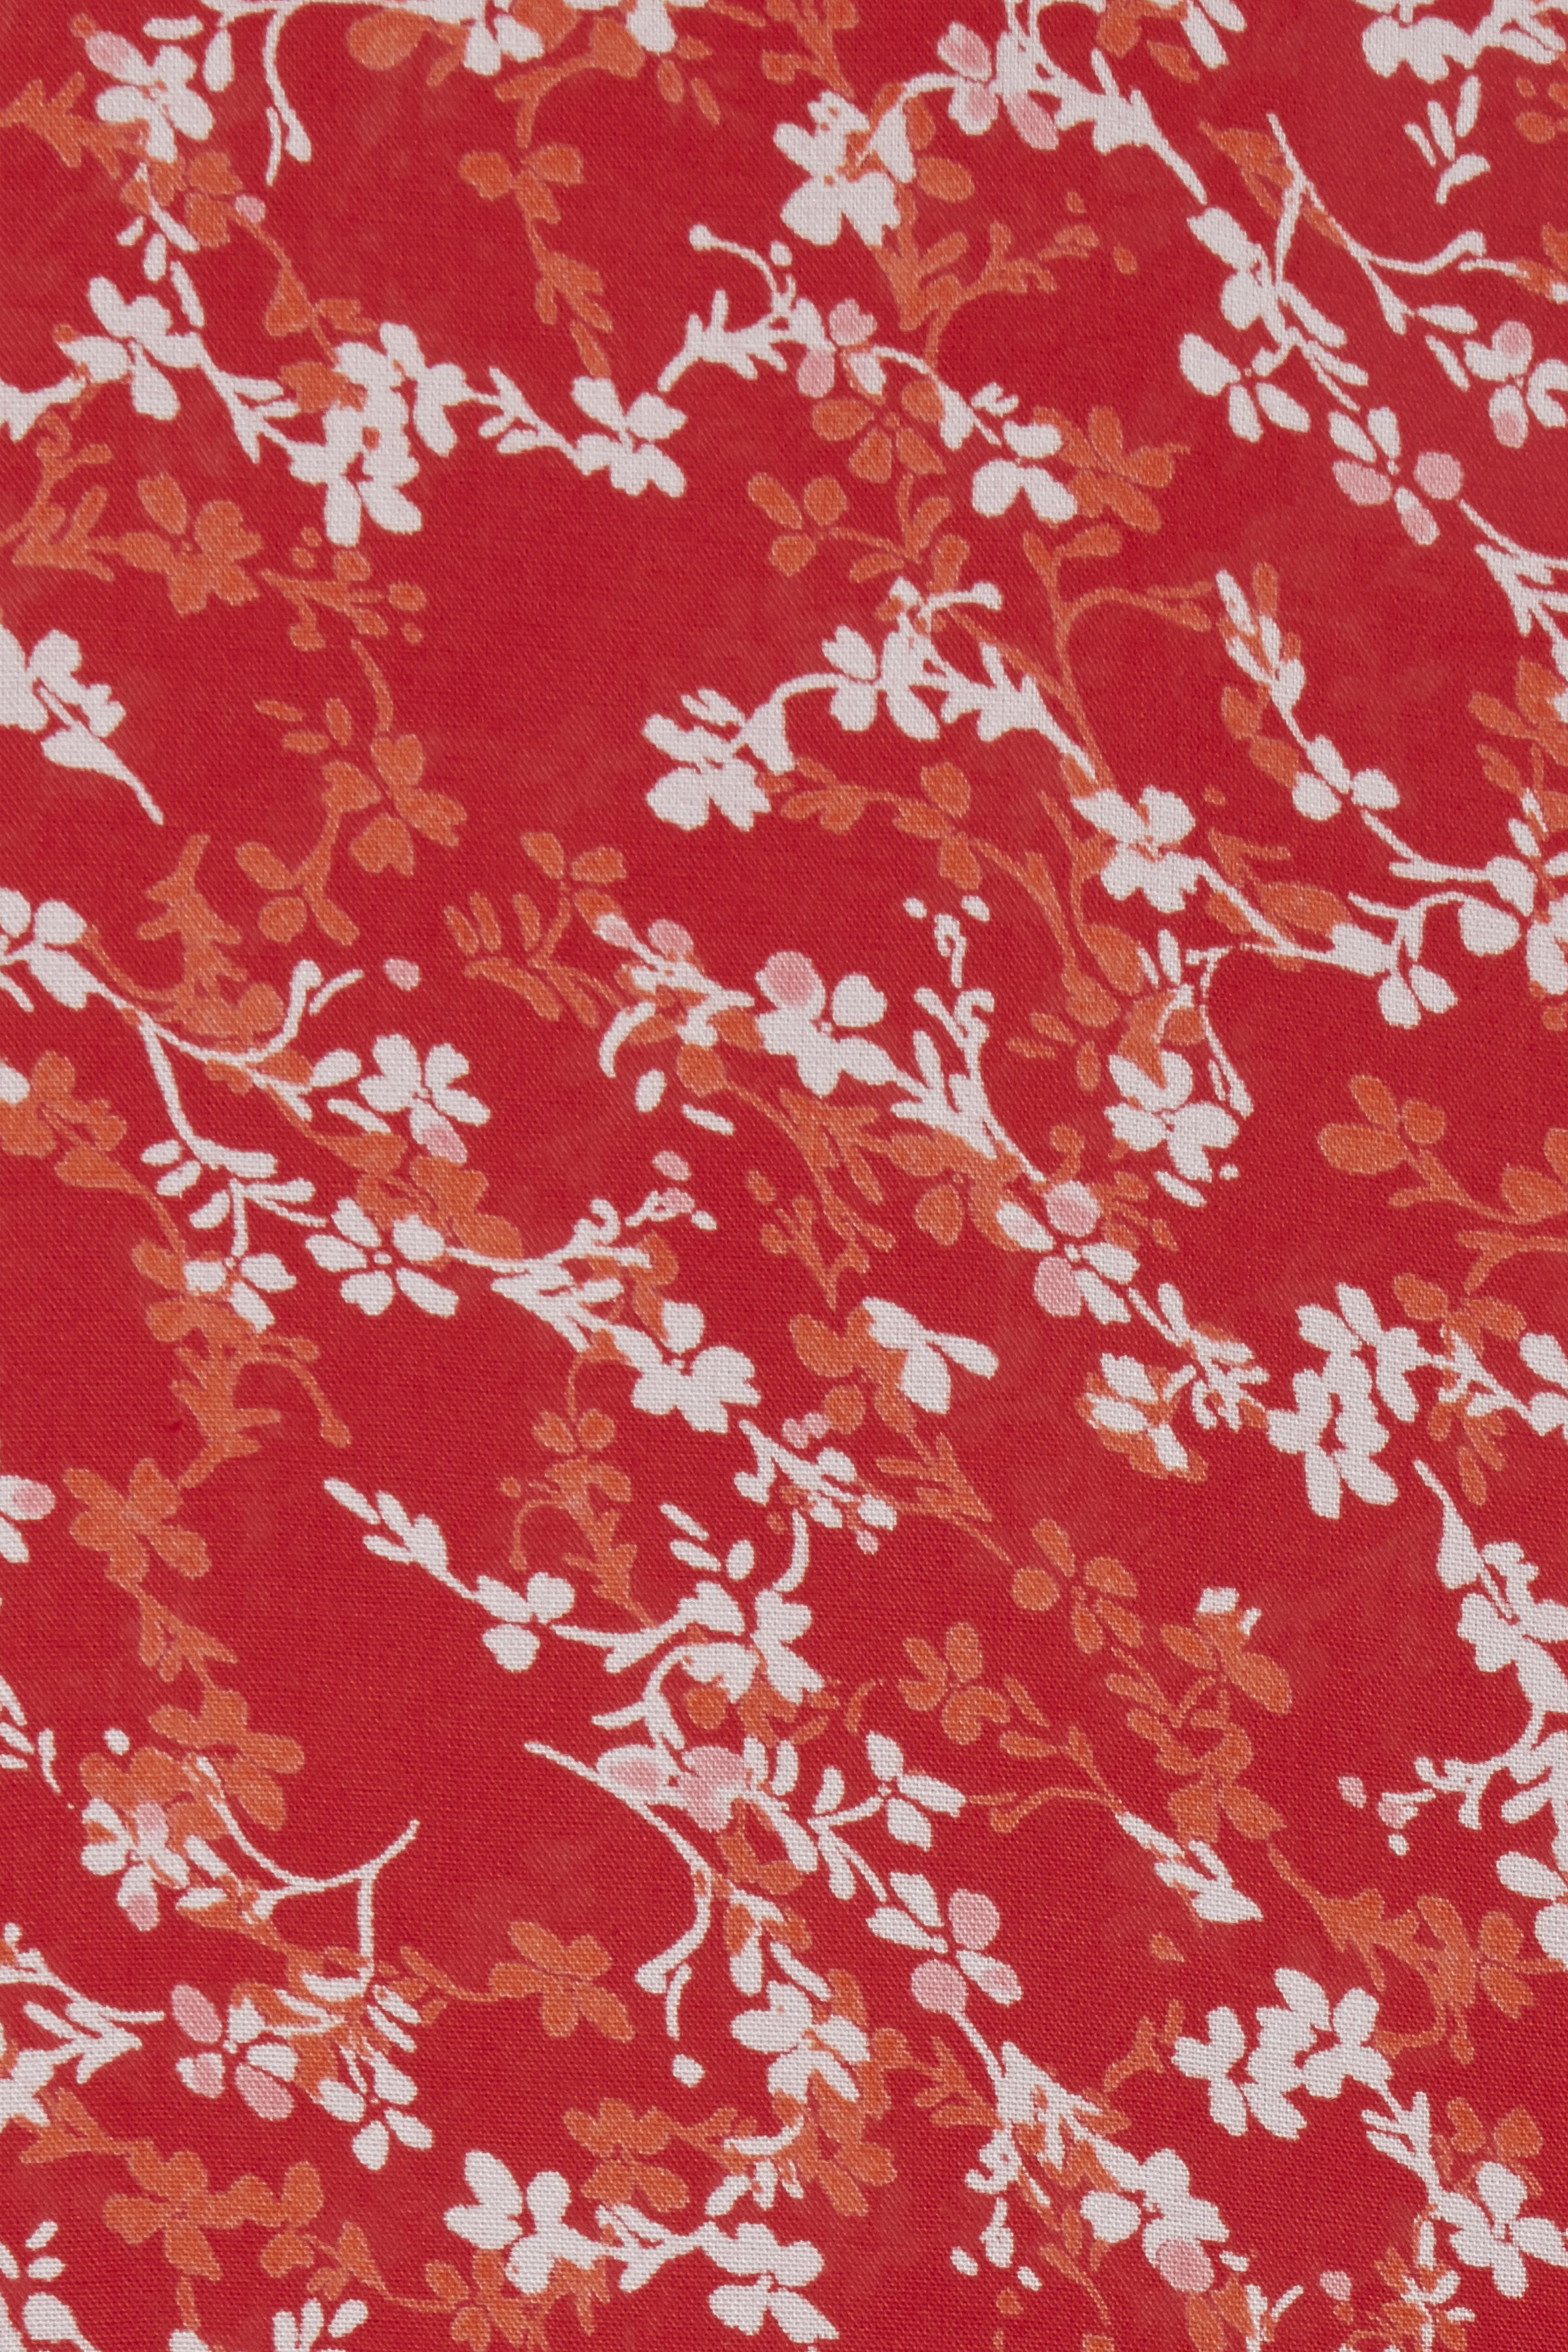 Fiery Red mix Kjole – Køb Fiery Red mix Kjole fra str. XS-XL her